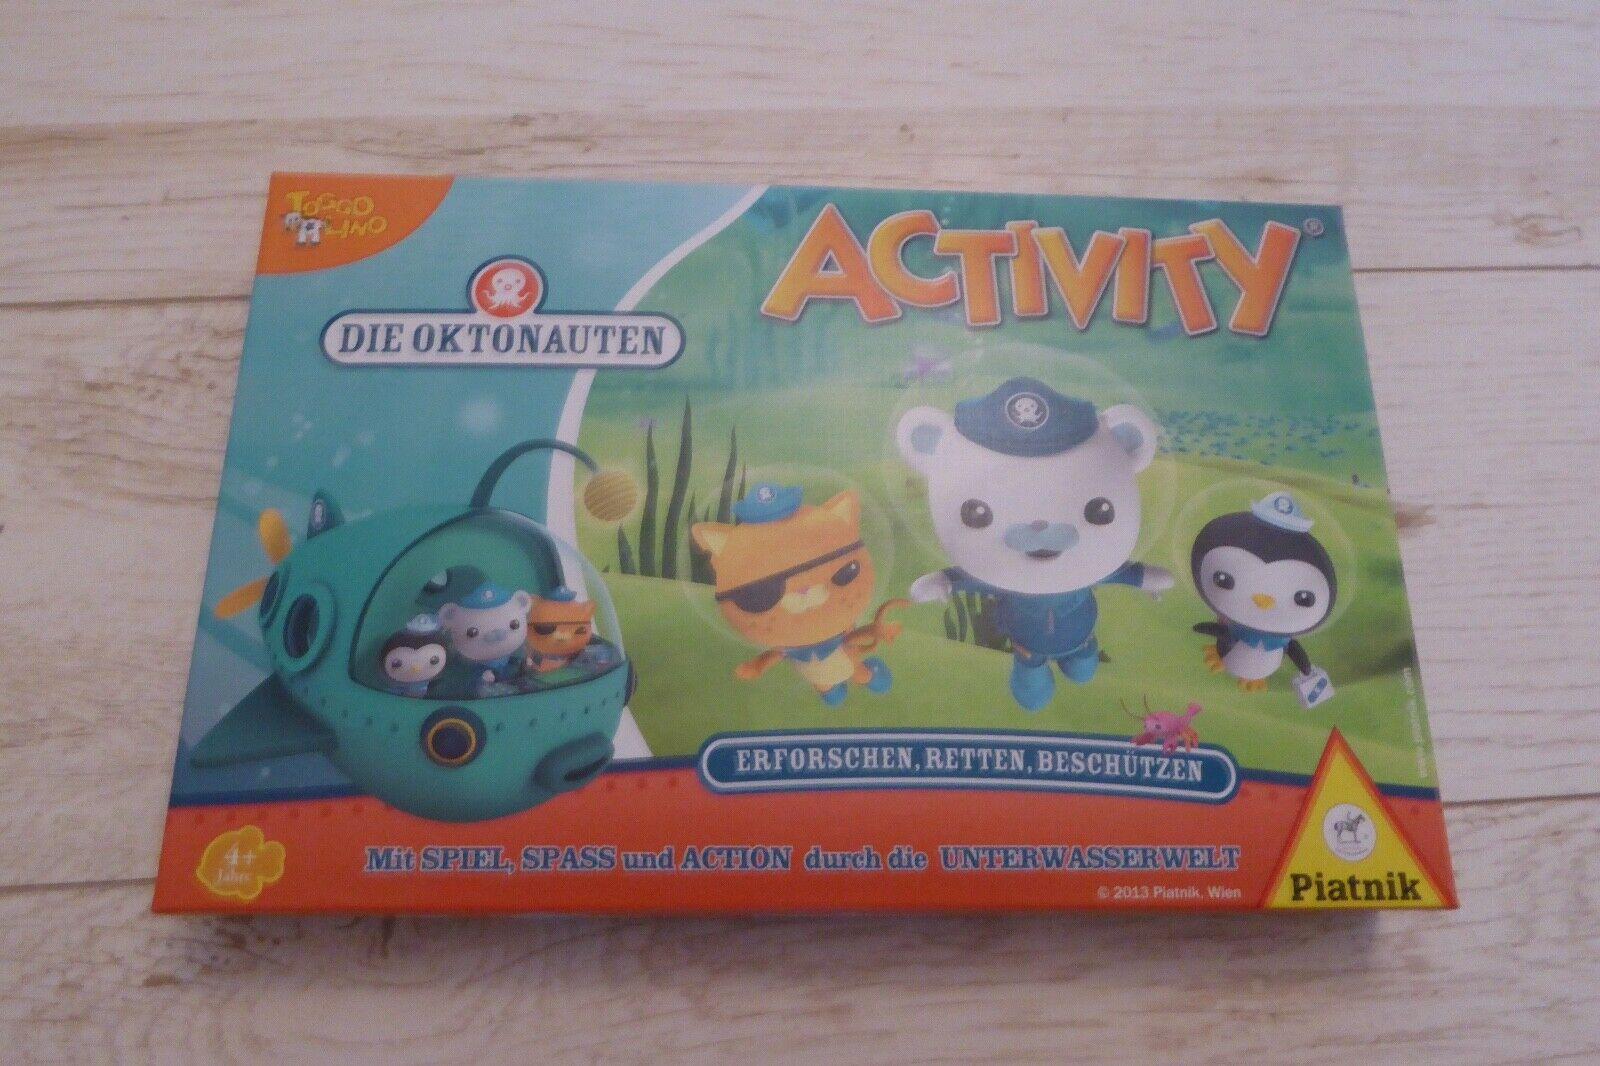 Die Oktonauten Activity Gesellschaftsspiel Kinder Piatnik 604942